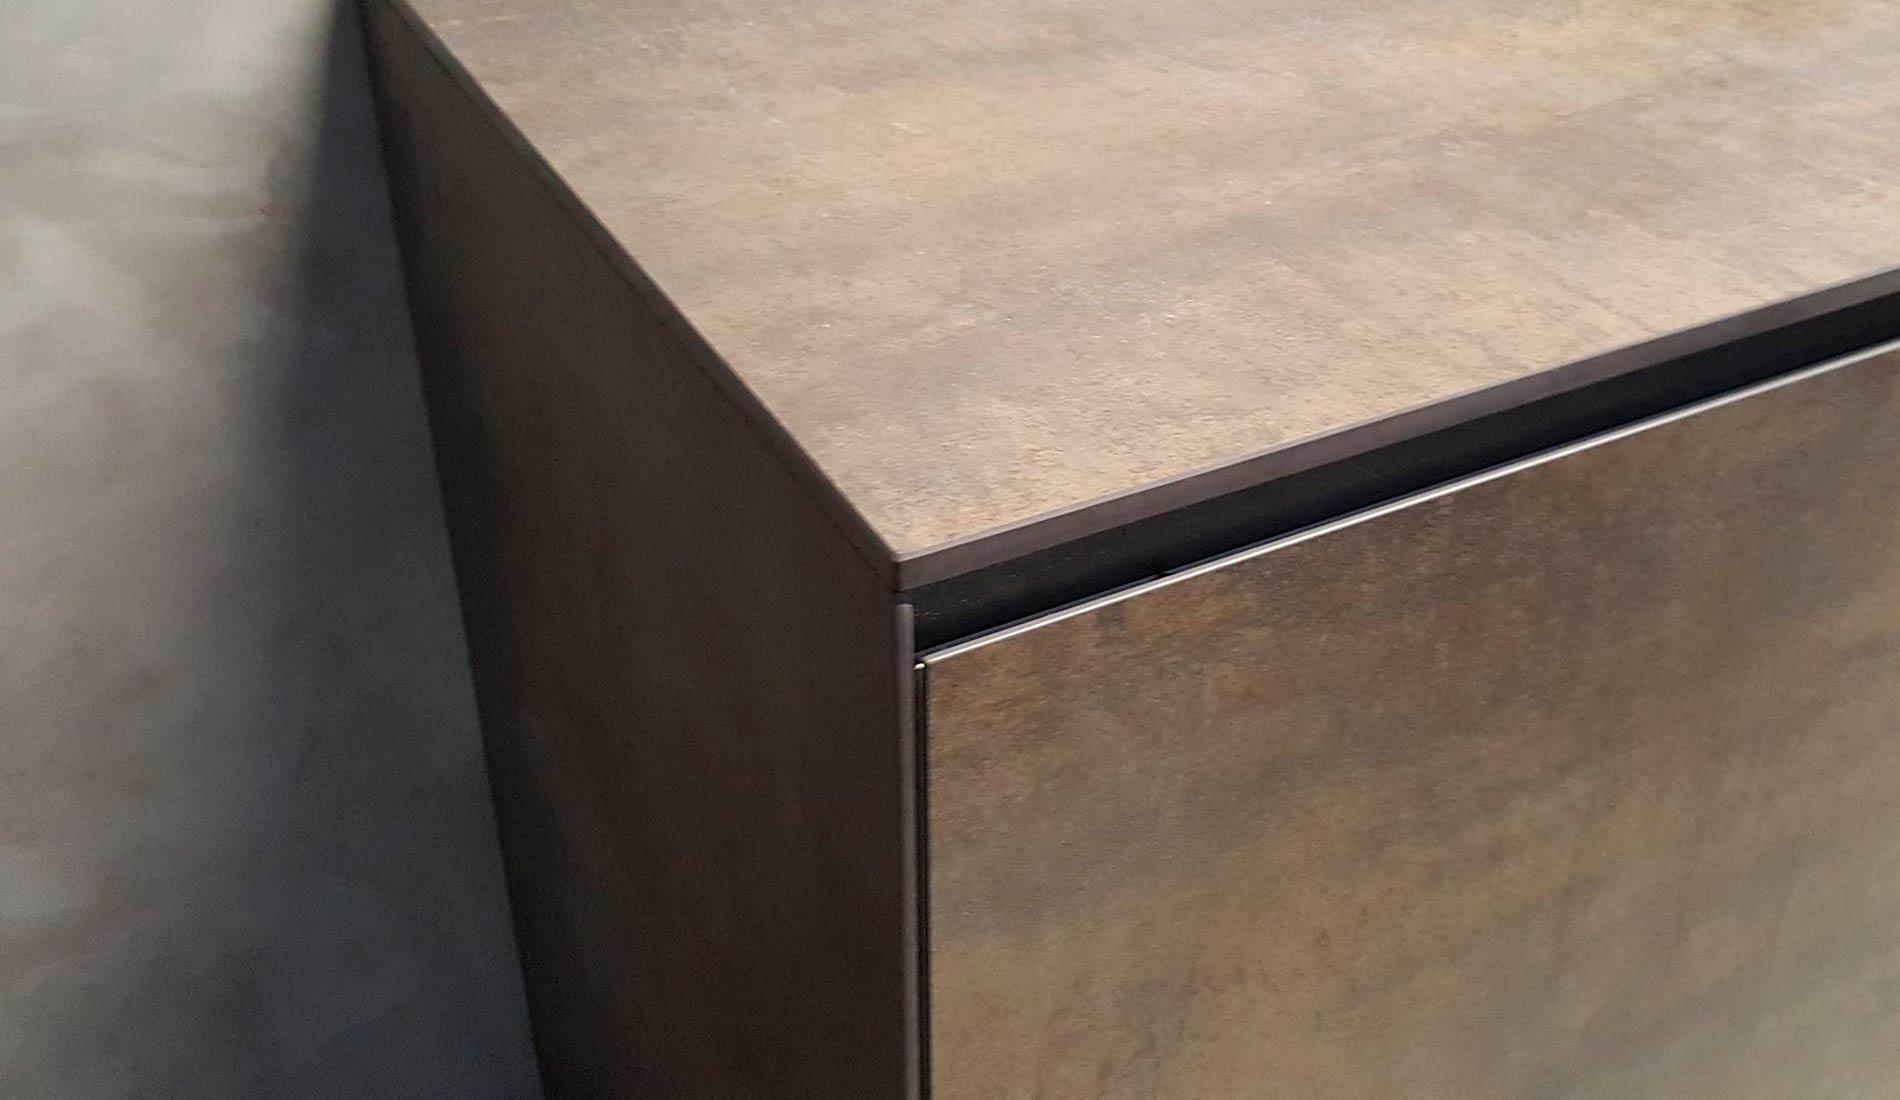 Tirador integrado en la puerta. Modelo Alborán de Senssia en acabado cerámica Iron Moss.